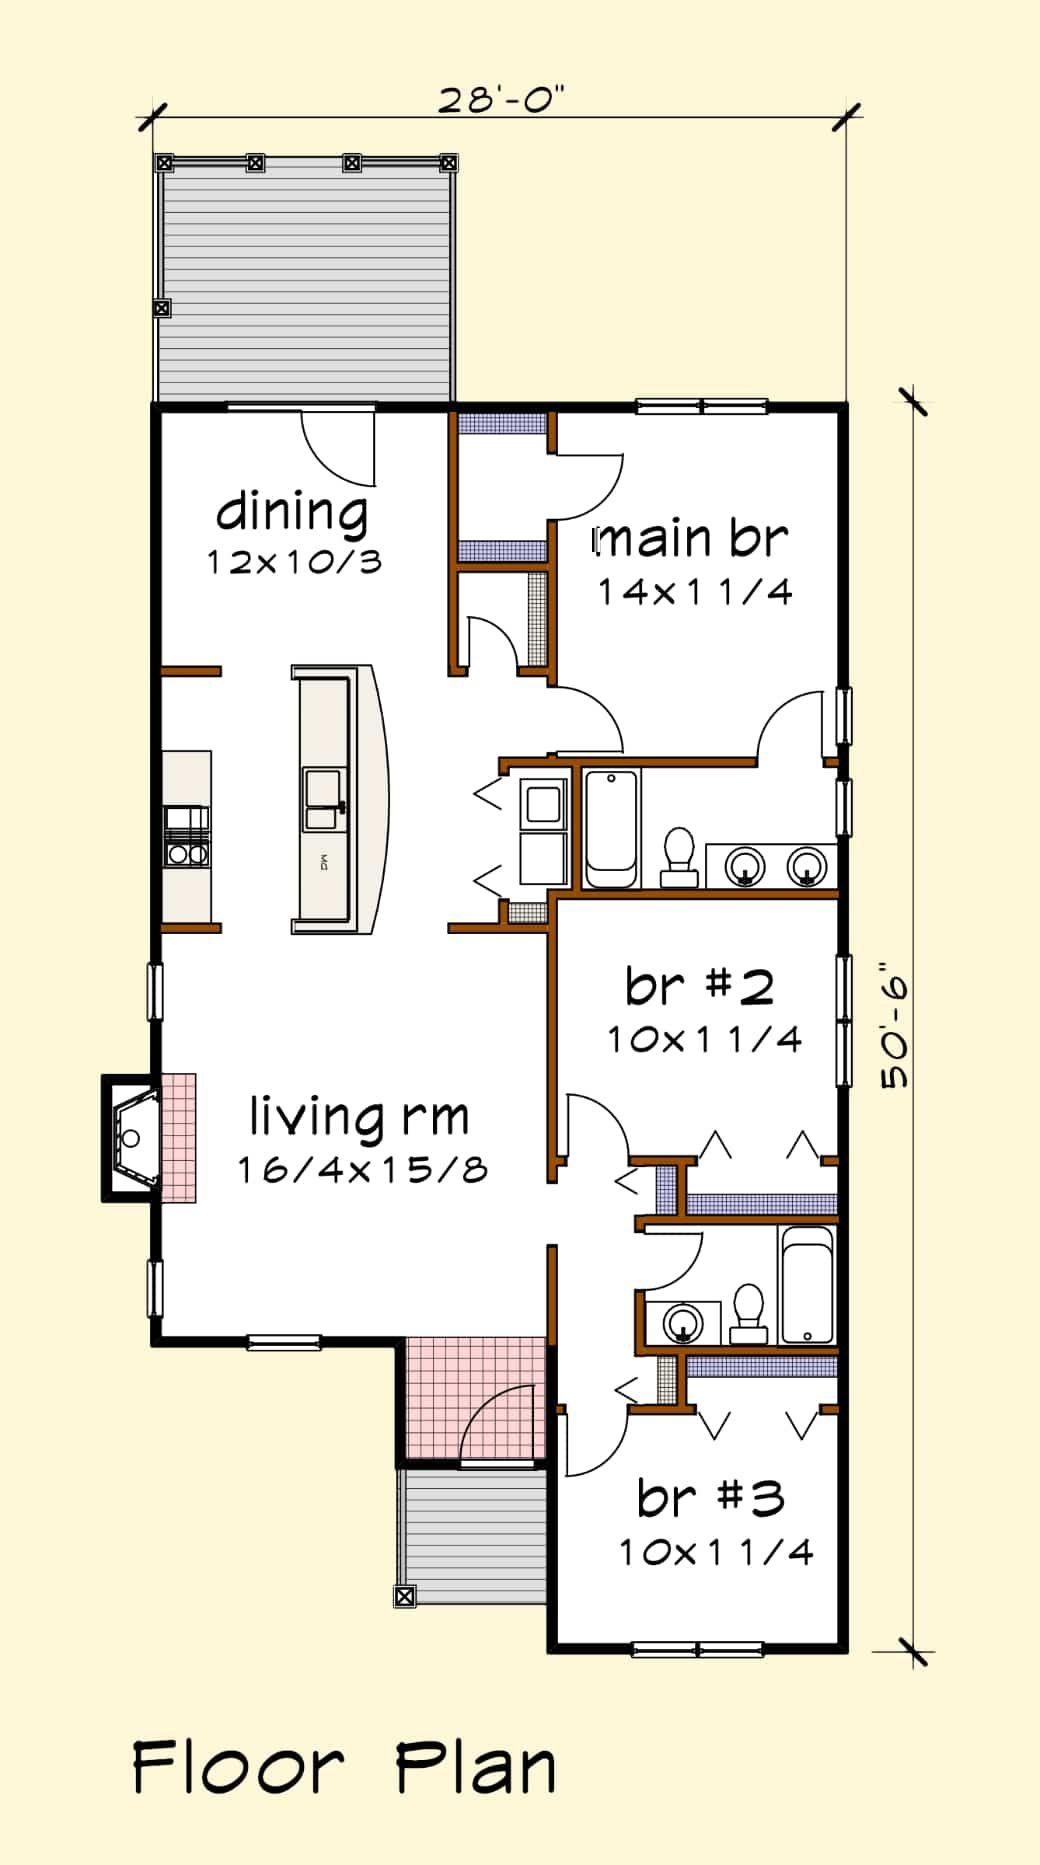 House Plan 1206c Standard Series Thompsonplans Com Floor Plans House Plans How To Plan